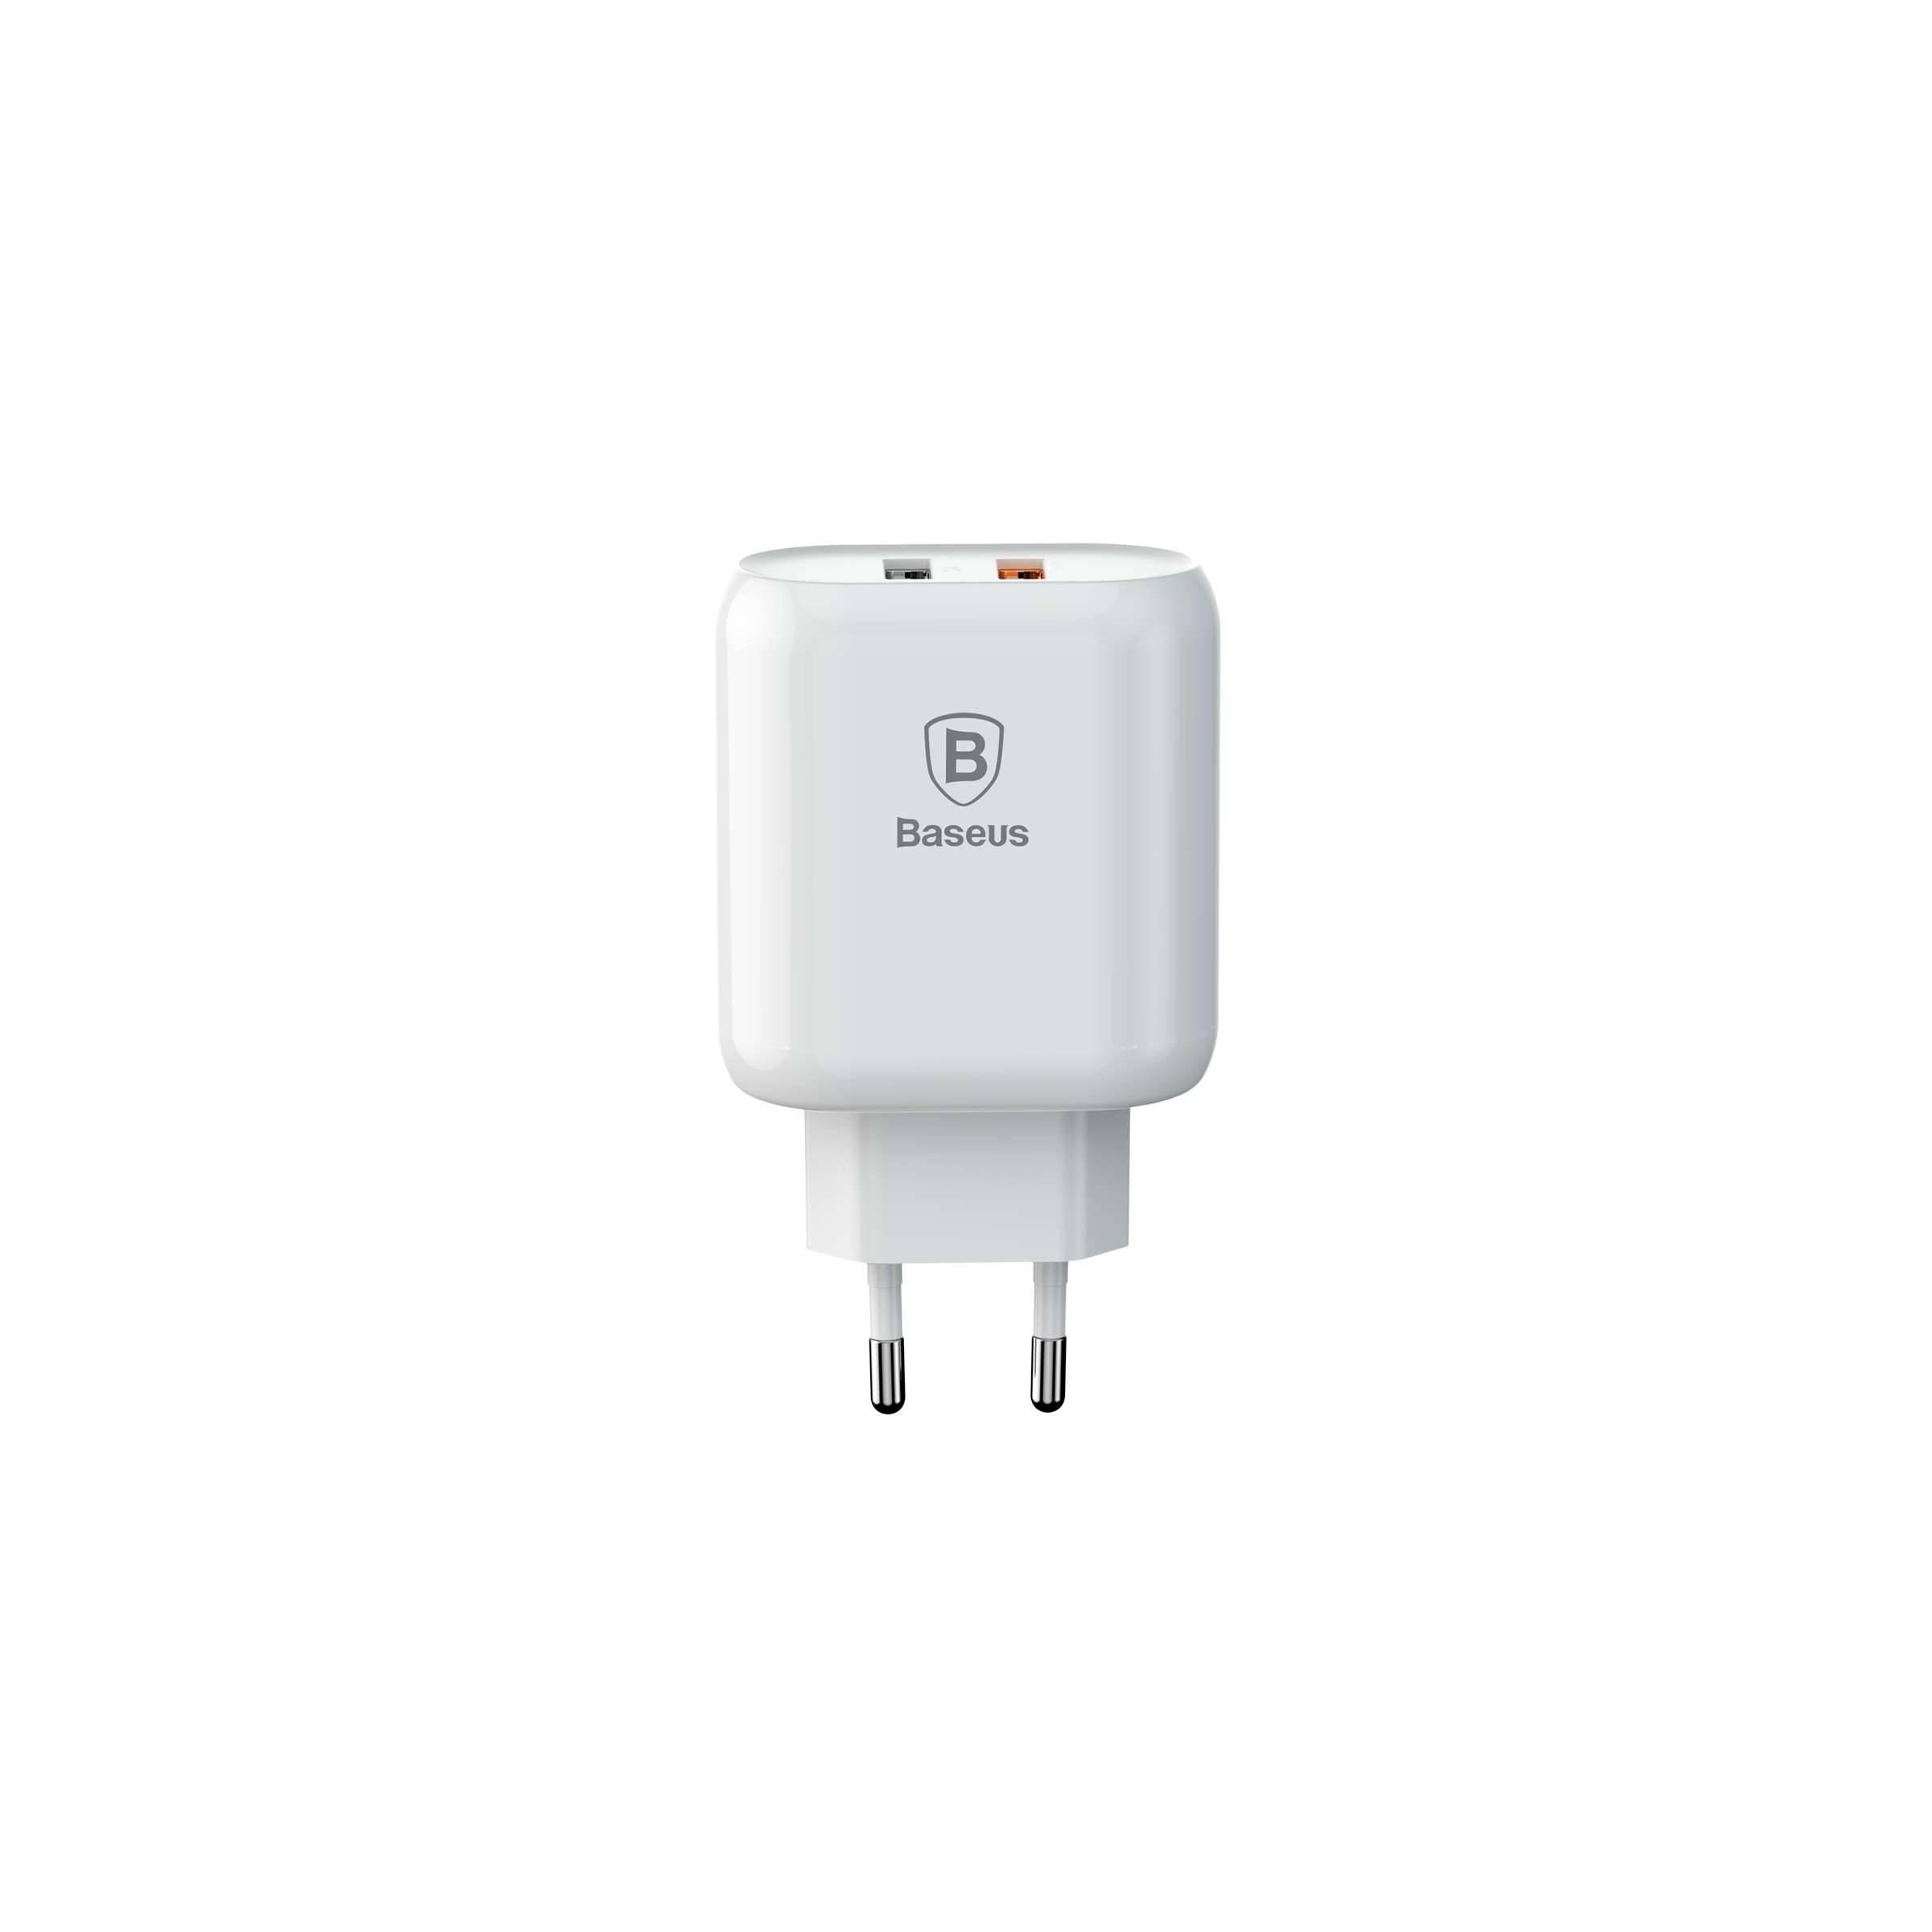 baseus – Baseus iphone/ipad usb oplader qc 2.0 x2 (23w ialt) fra mackabler.dk